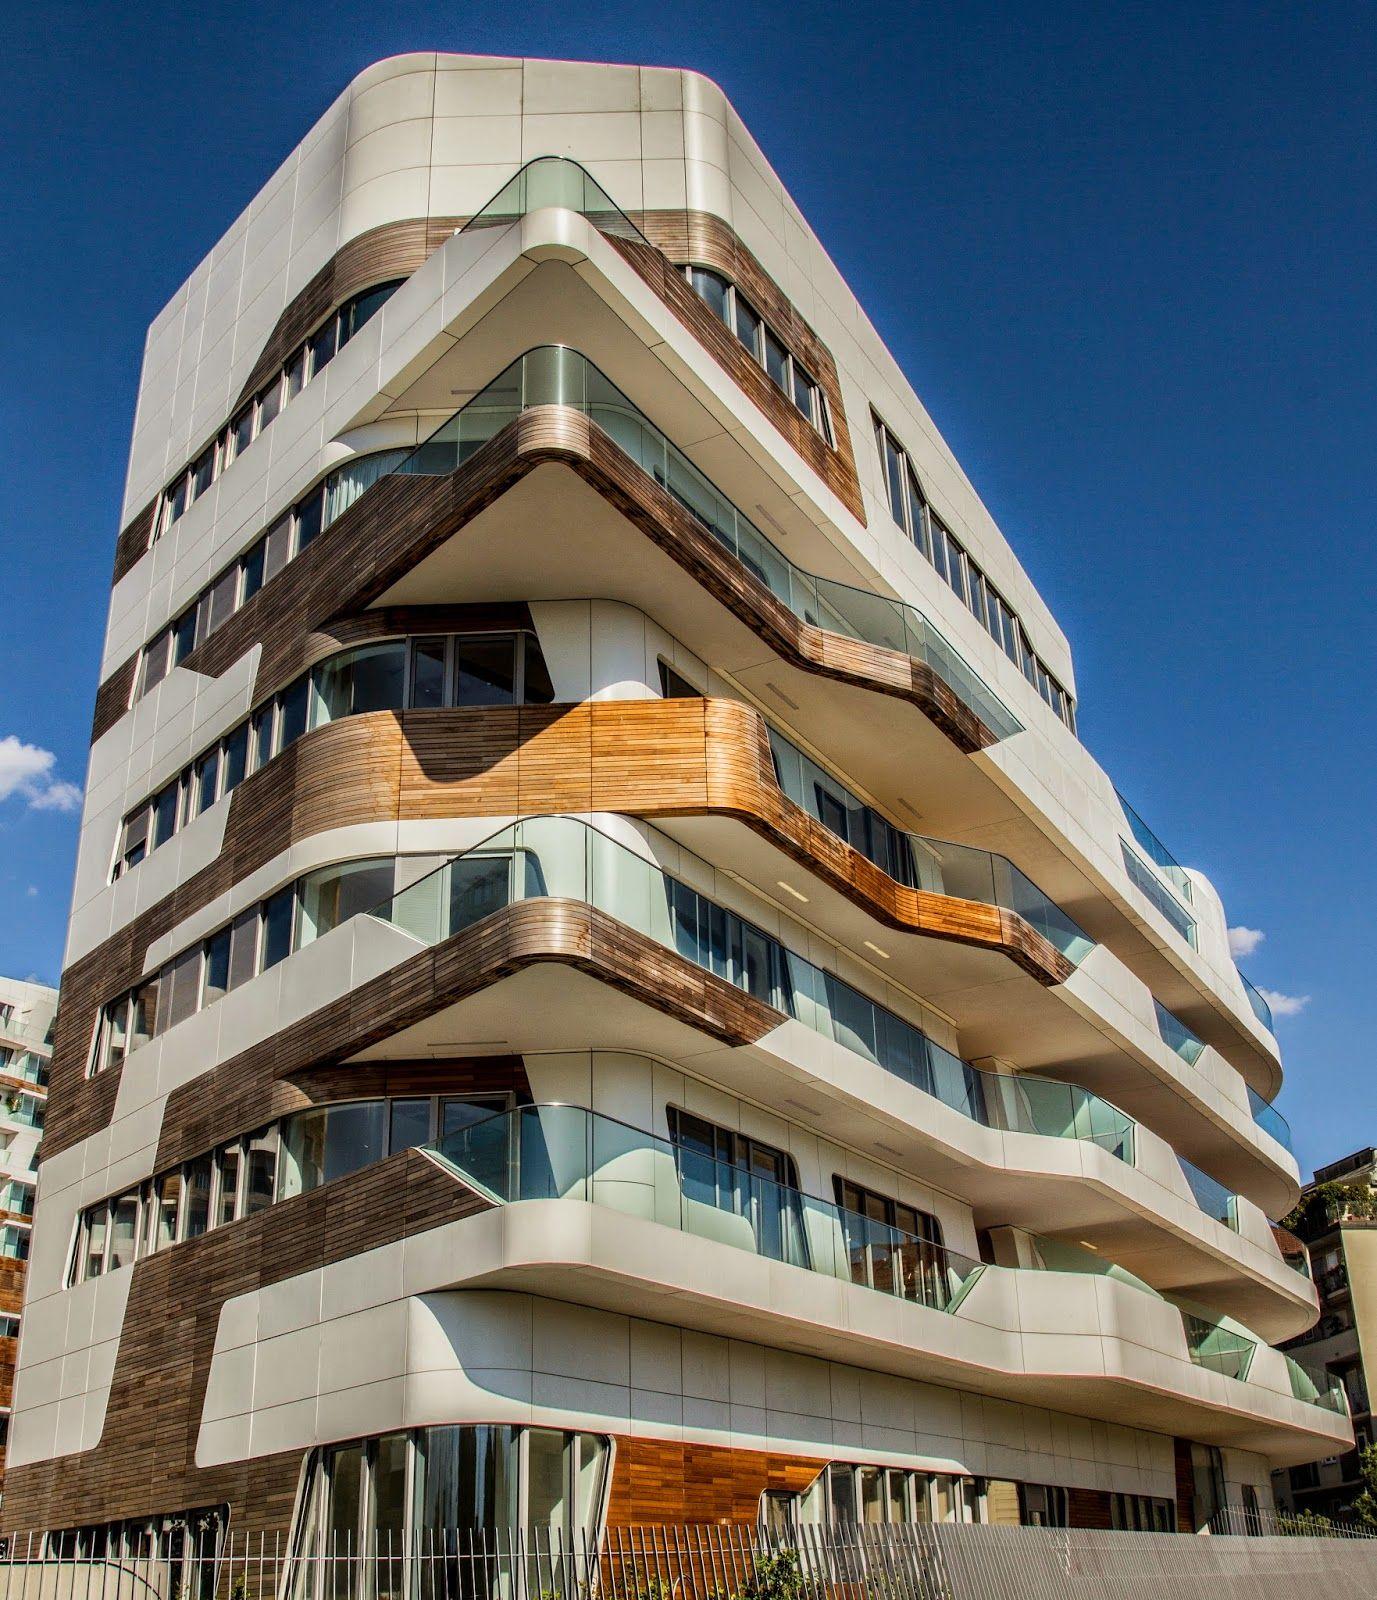 Modern Architecture In Italy citylife milanozaha hadid | сбор: архитектура общественная